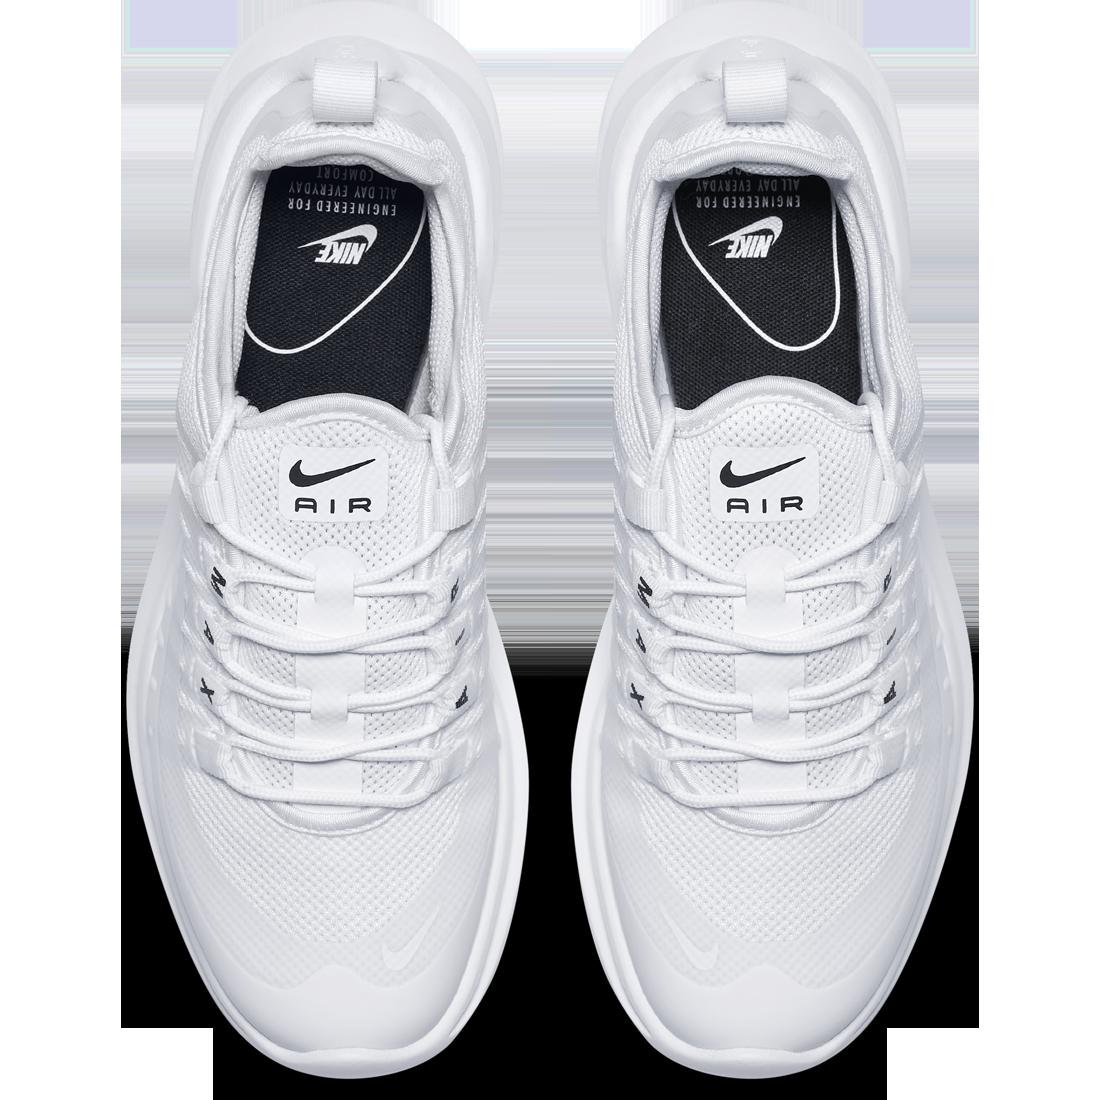 7d612f9d89538 Women s Nike Air Max Asics NIKE AA2168-100 - 11STREET